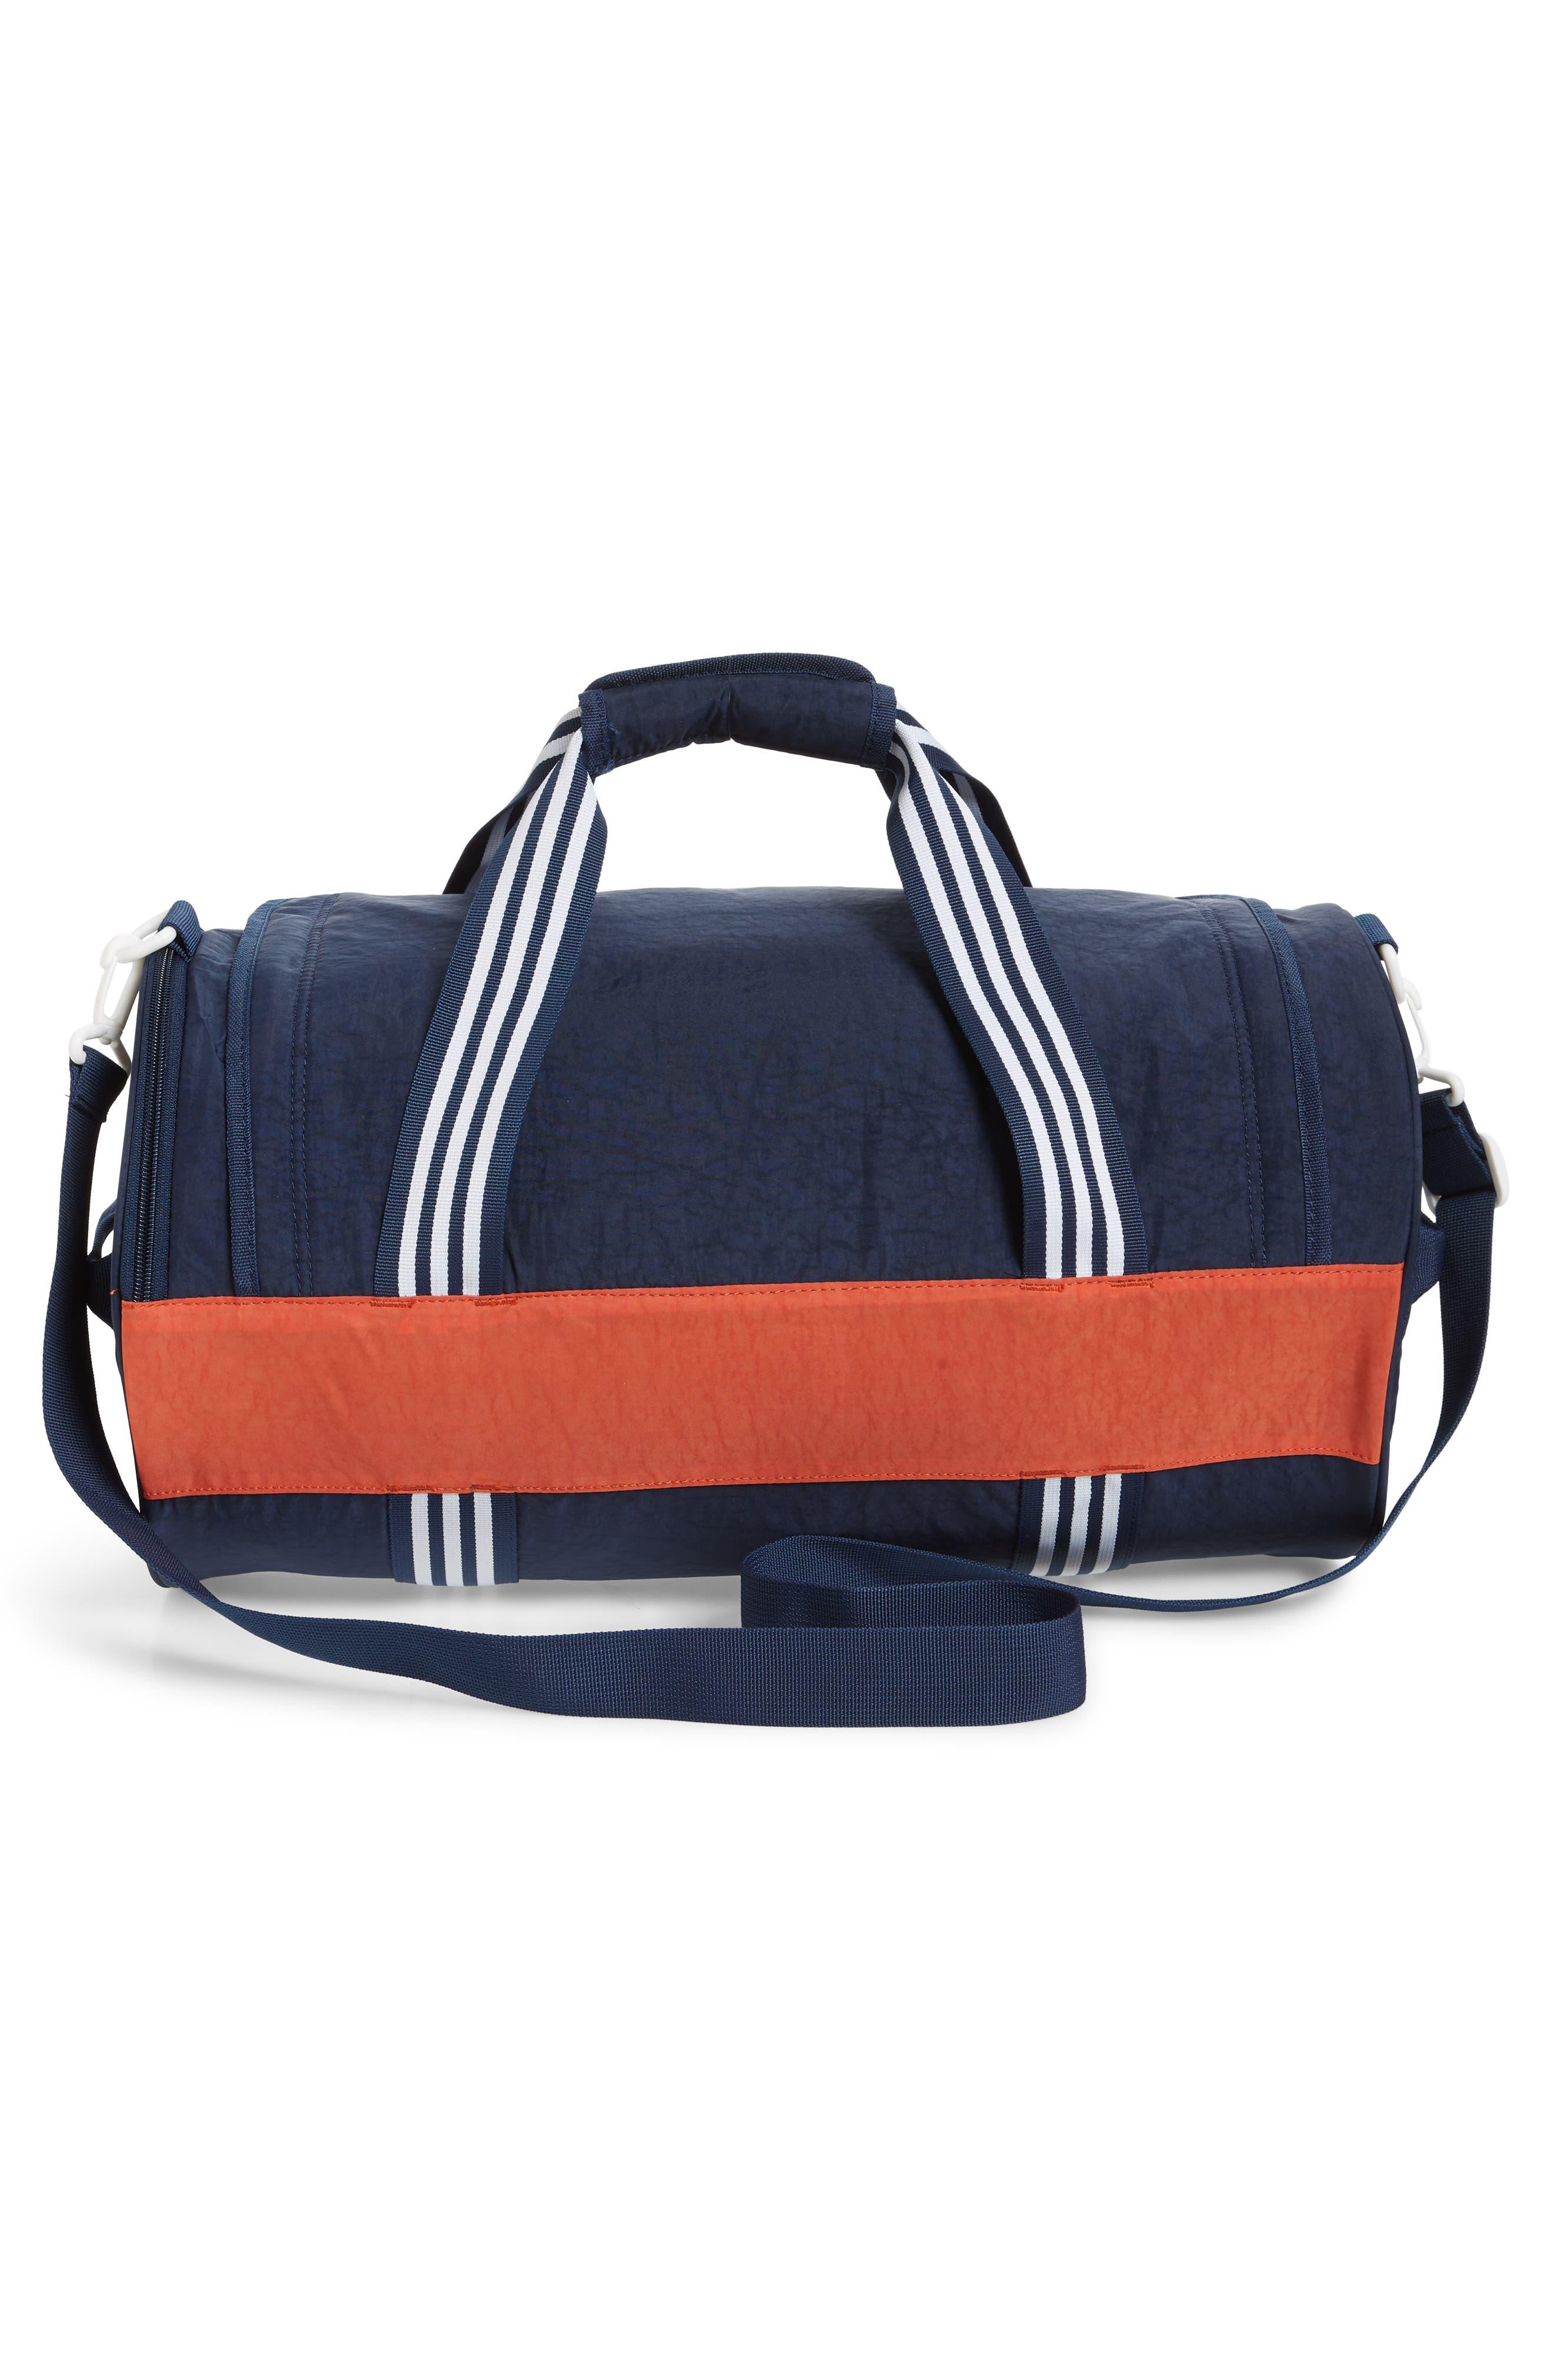 ADIDAS ORIGINALS, adidas Spirit Roll Duffle Bag, Alternate thumbnail 3, color, COLLEGIATE NAVY/ AMBER/ WHITE